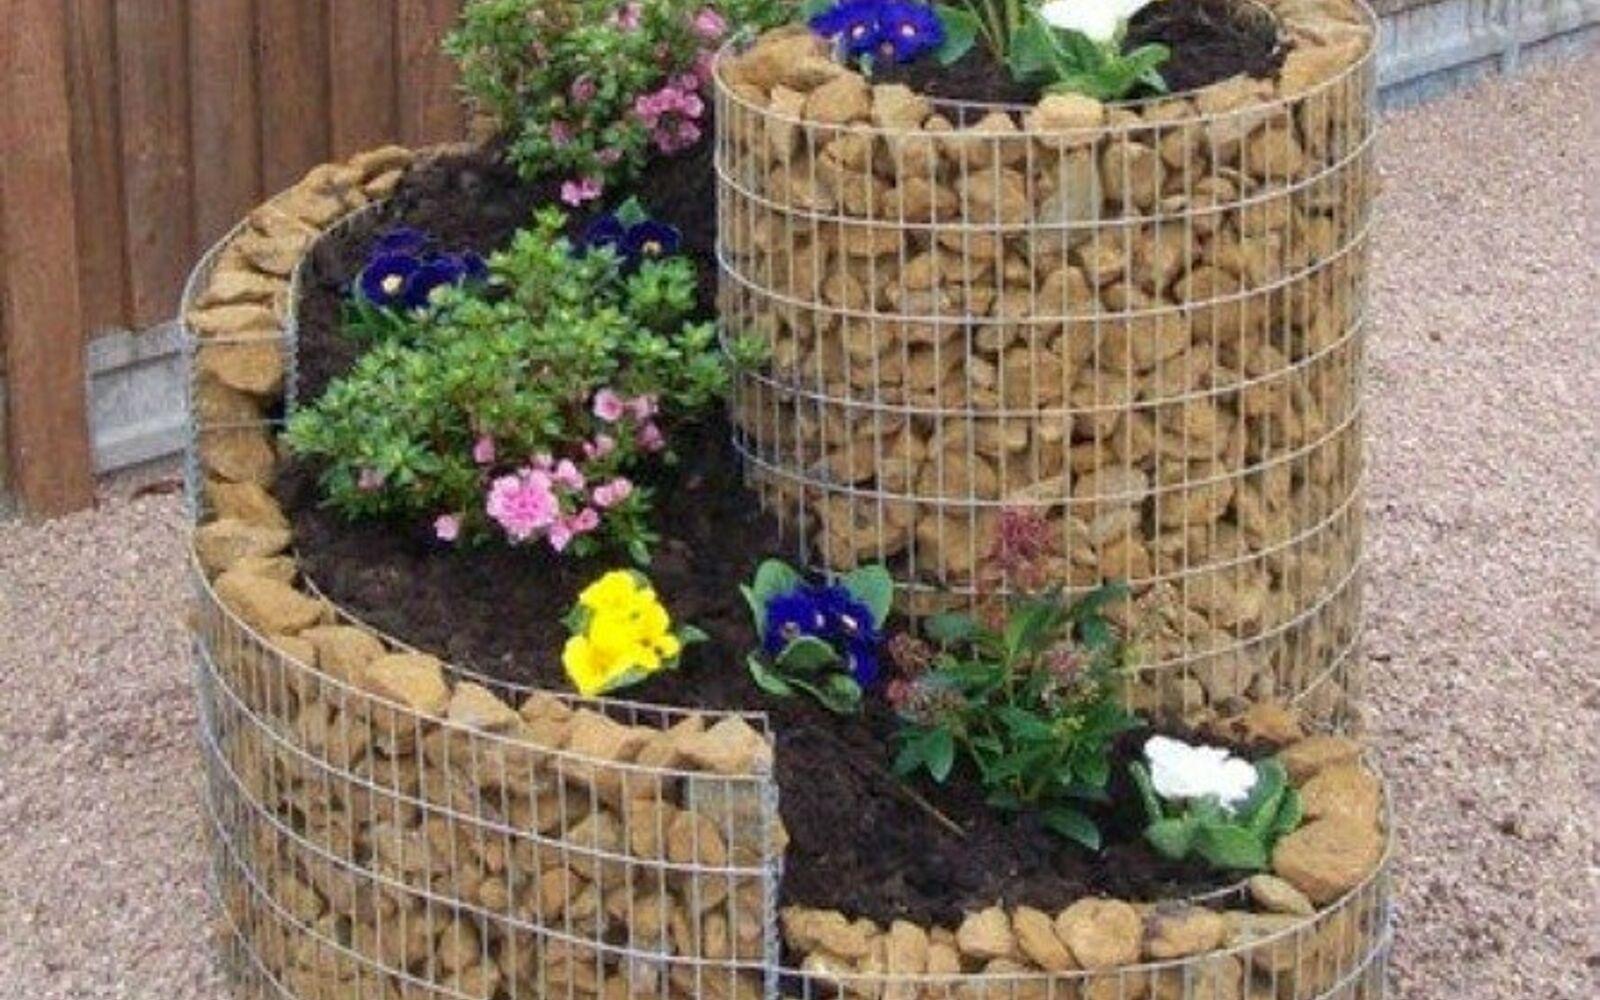 s 17 amazing garden features we ve been saving for summer, gardening, outdoor living, ponds water features, This compact spiral garden